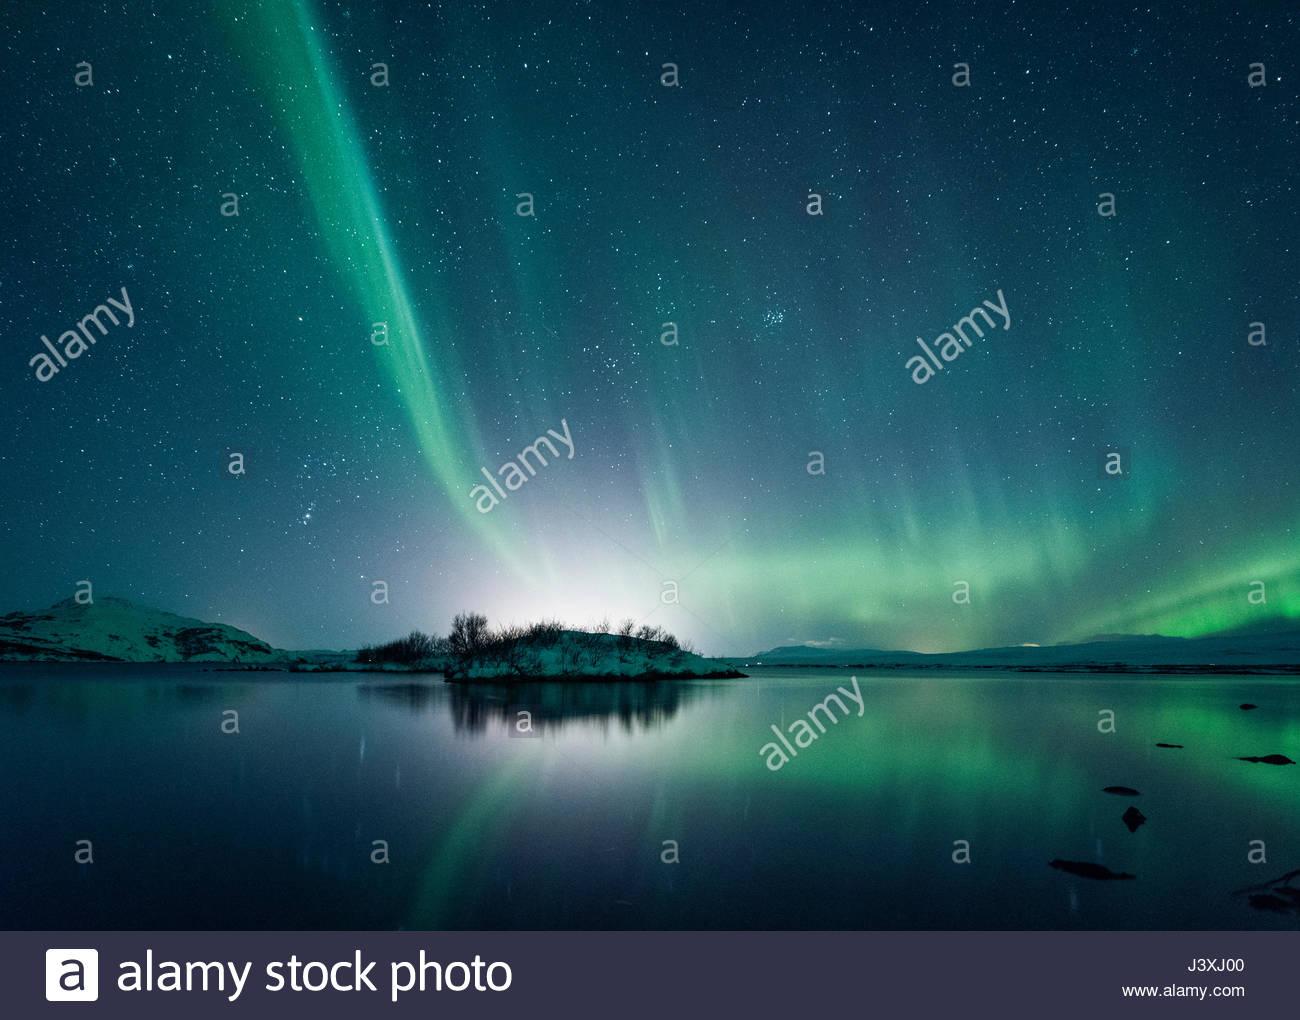 Luci del nord, Thingvellir, Islanda Immagini Stock